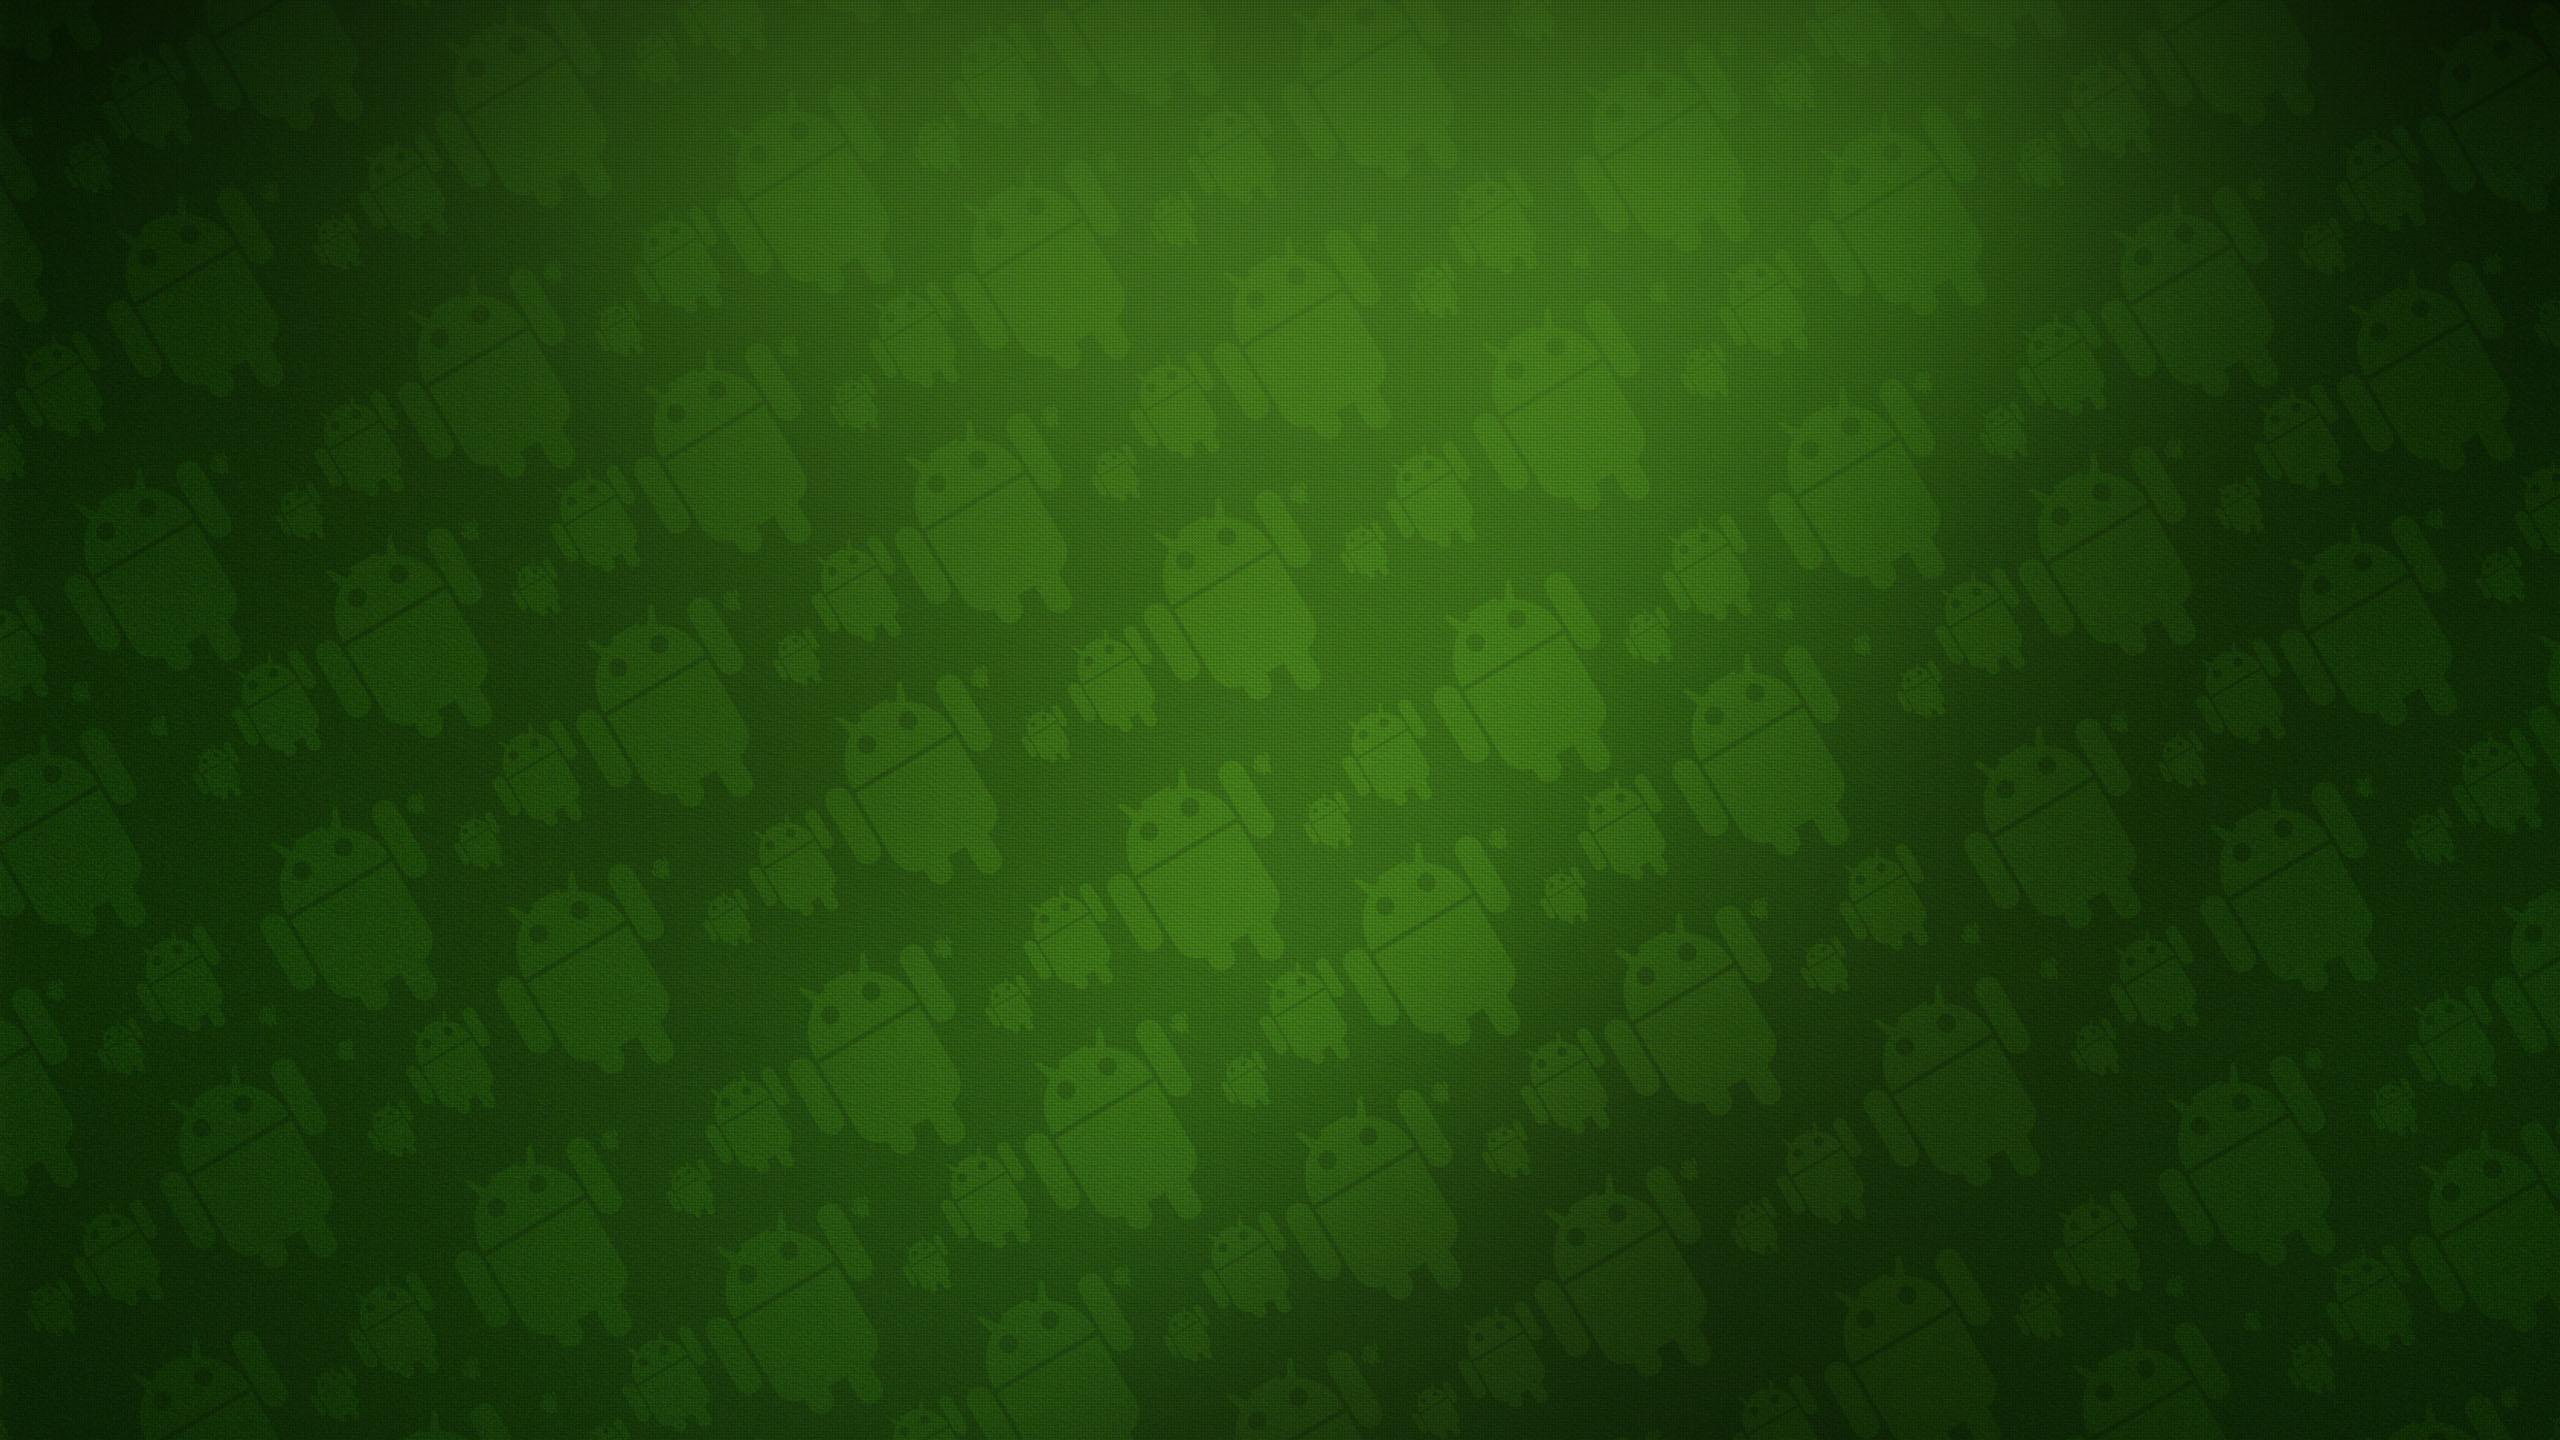 Plain Desktop wallpapers HD   488839 2560x1440